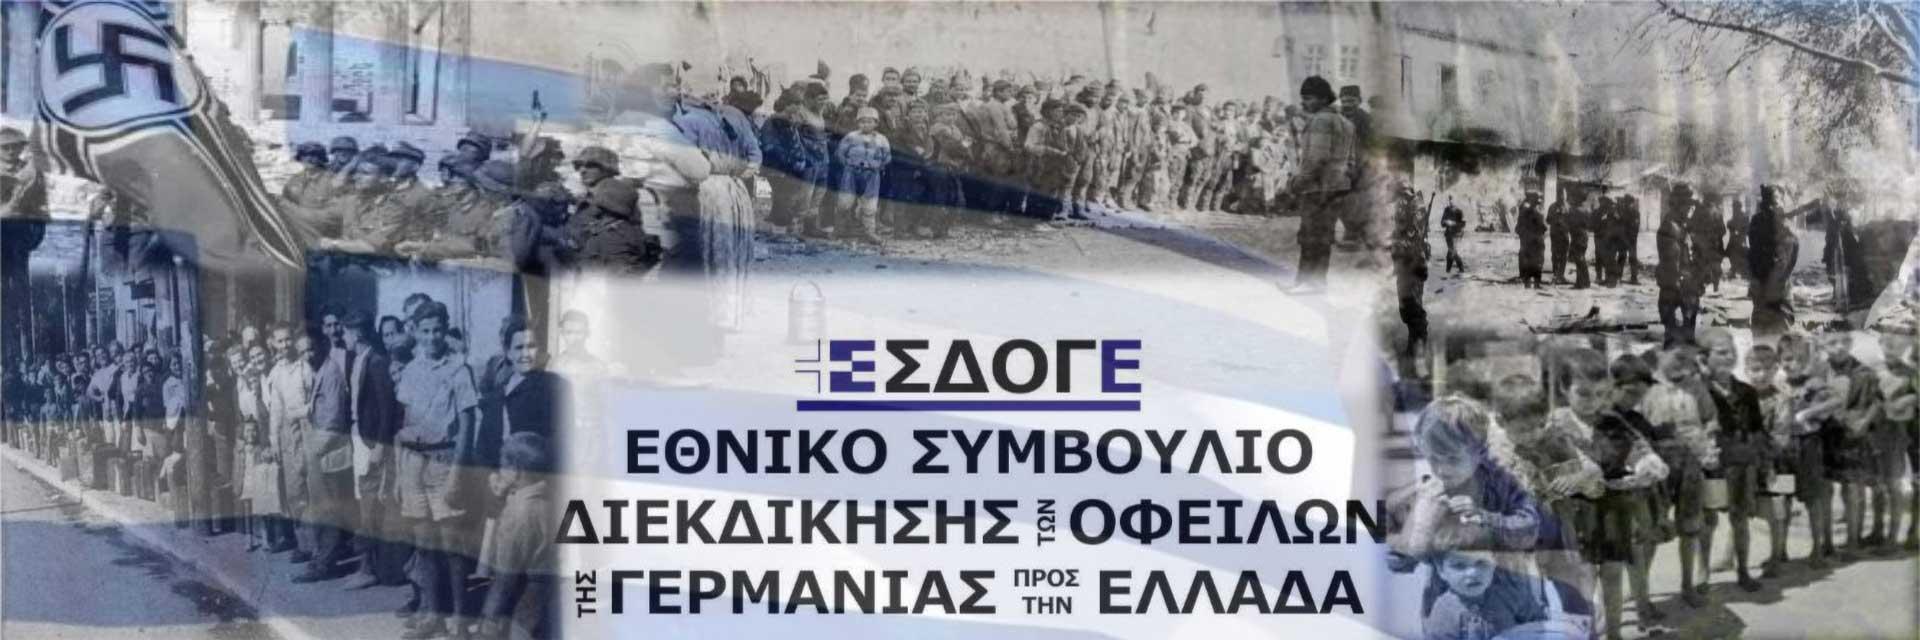 ESDOGE Banner